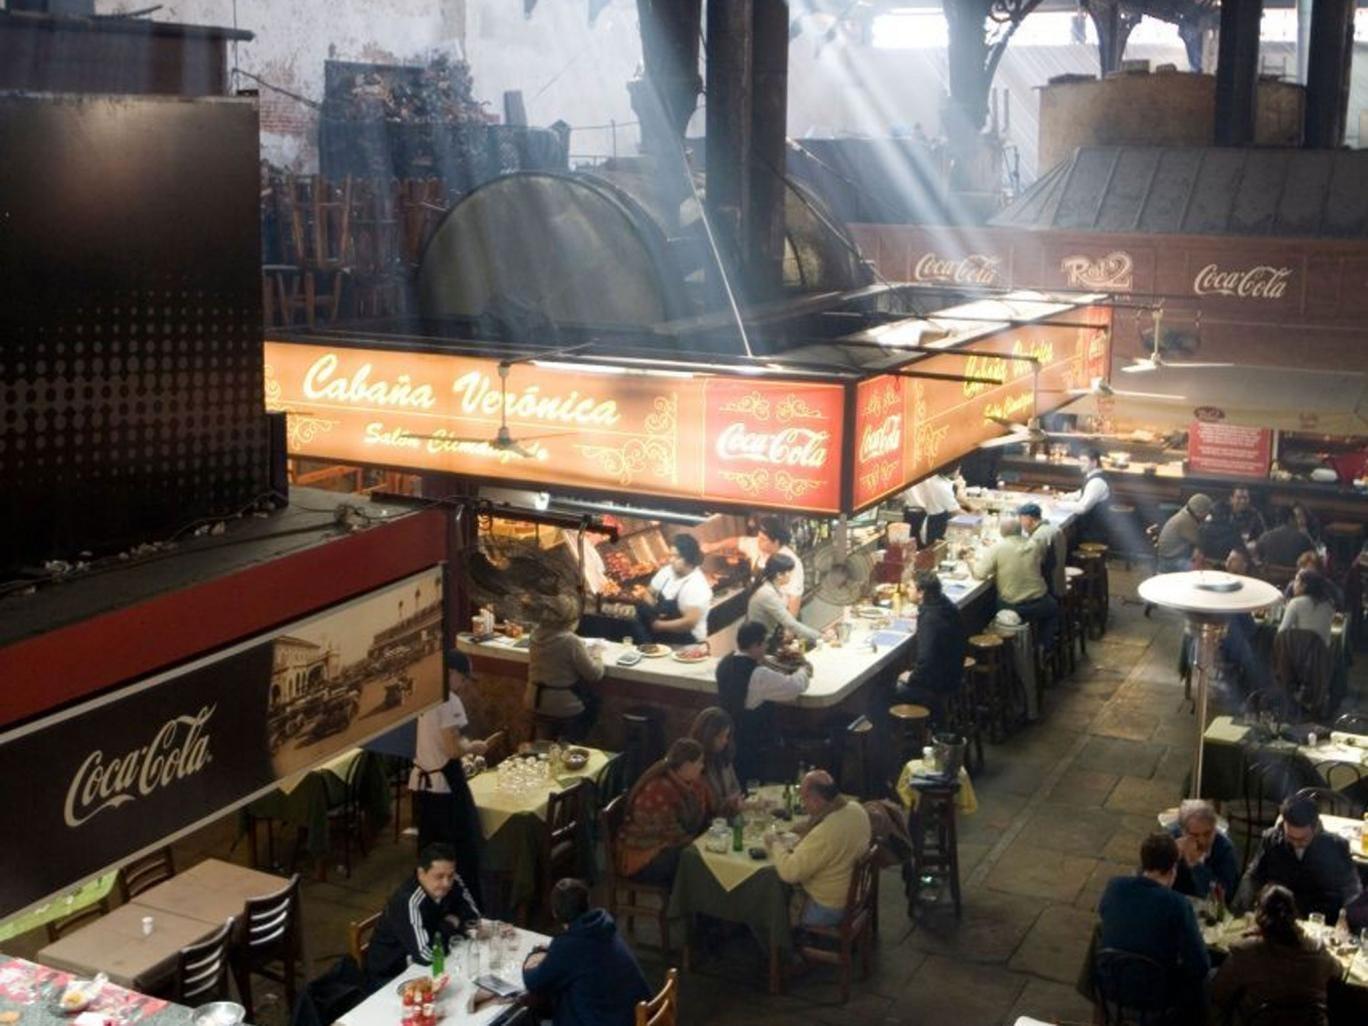 Top table: Restaurants at the Mercado del Puerto